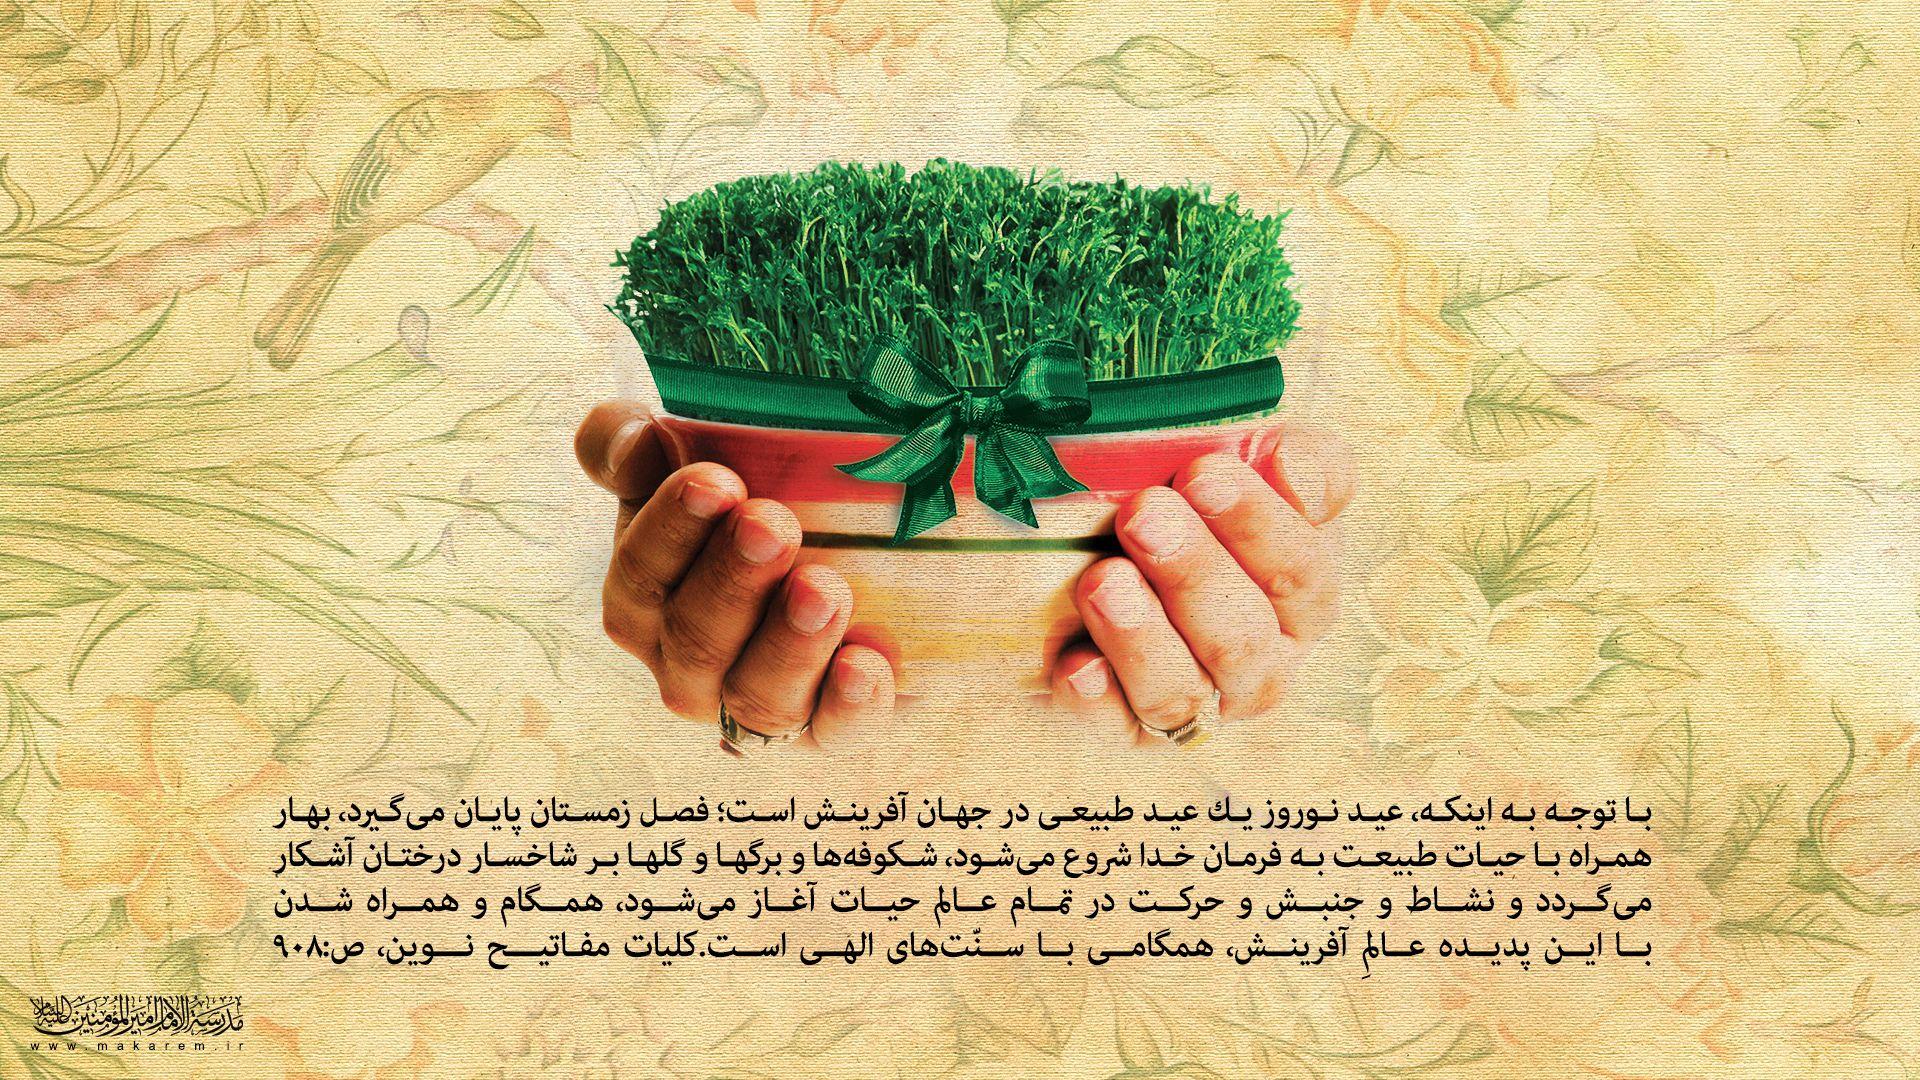 نوروز 05-مدرسه الامام امیر المومنین (ع)